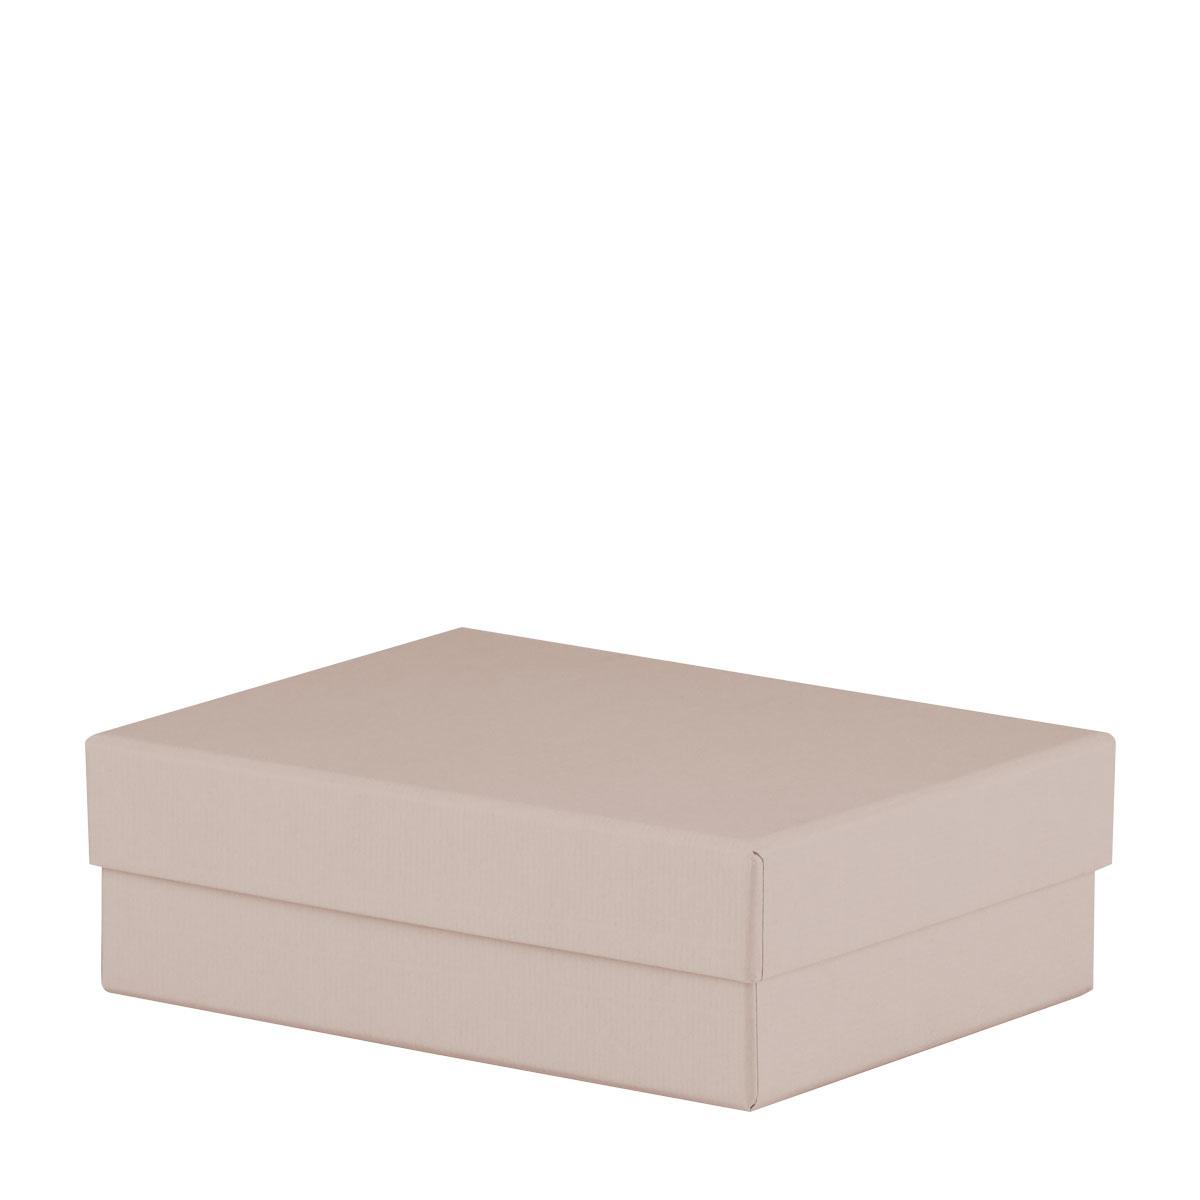 Rössler Boxline Kartonage white